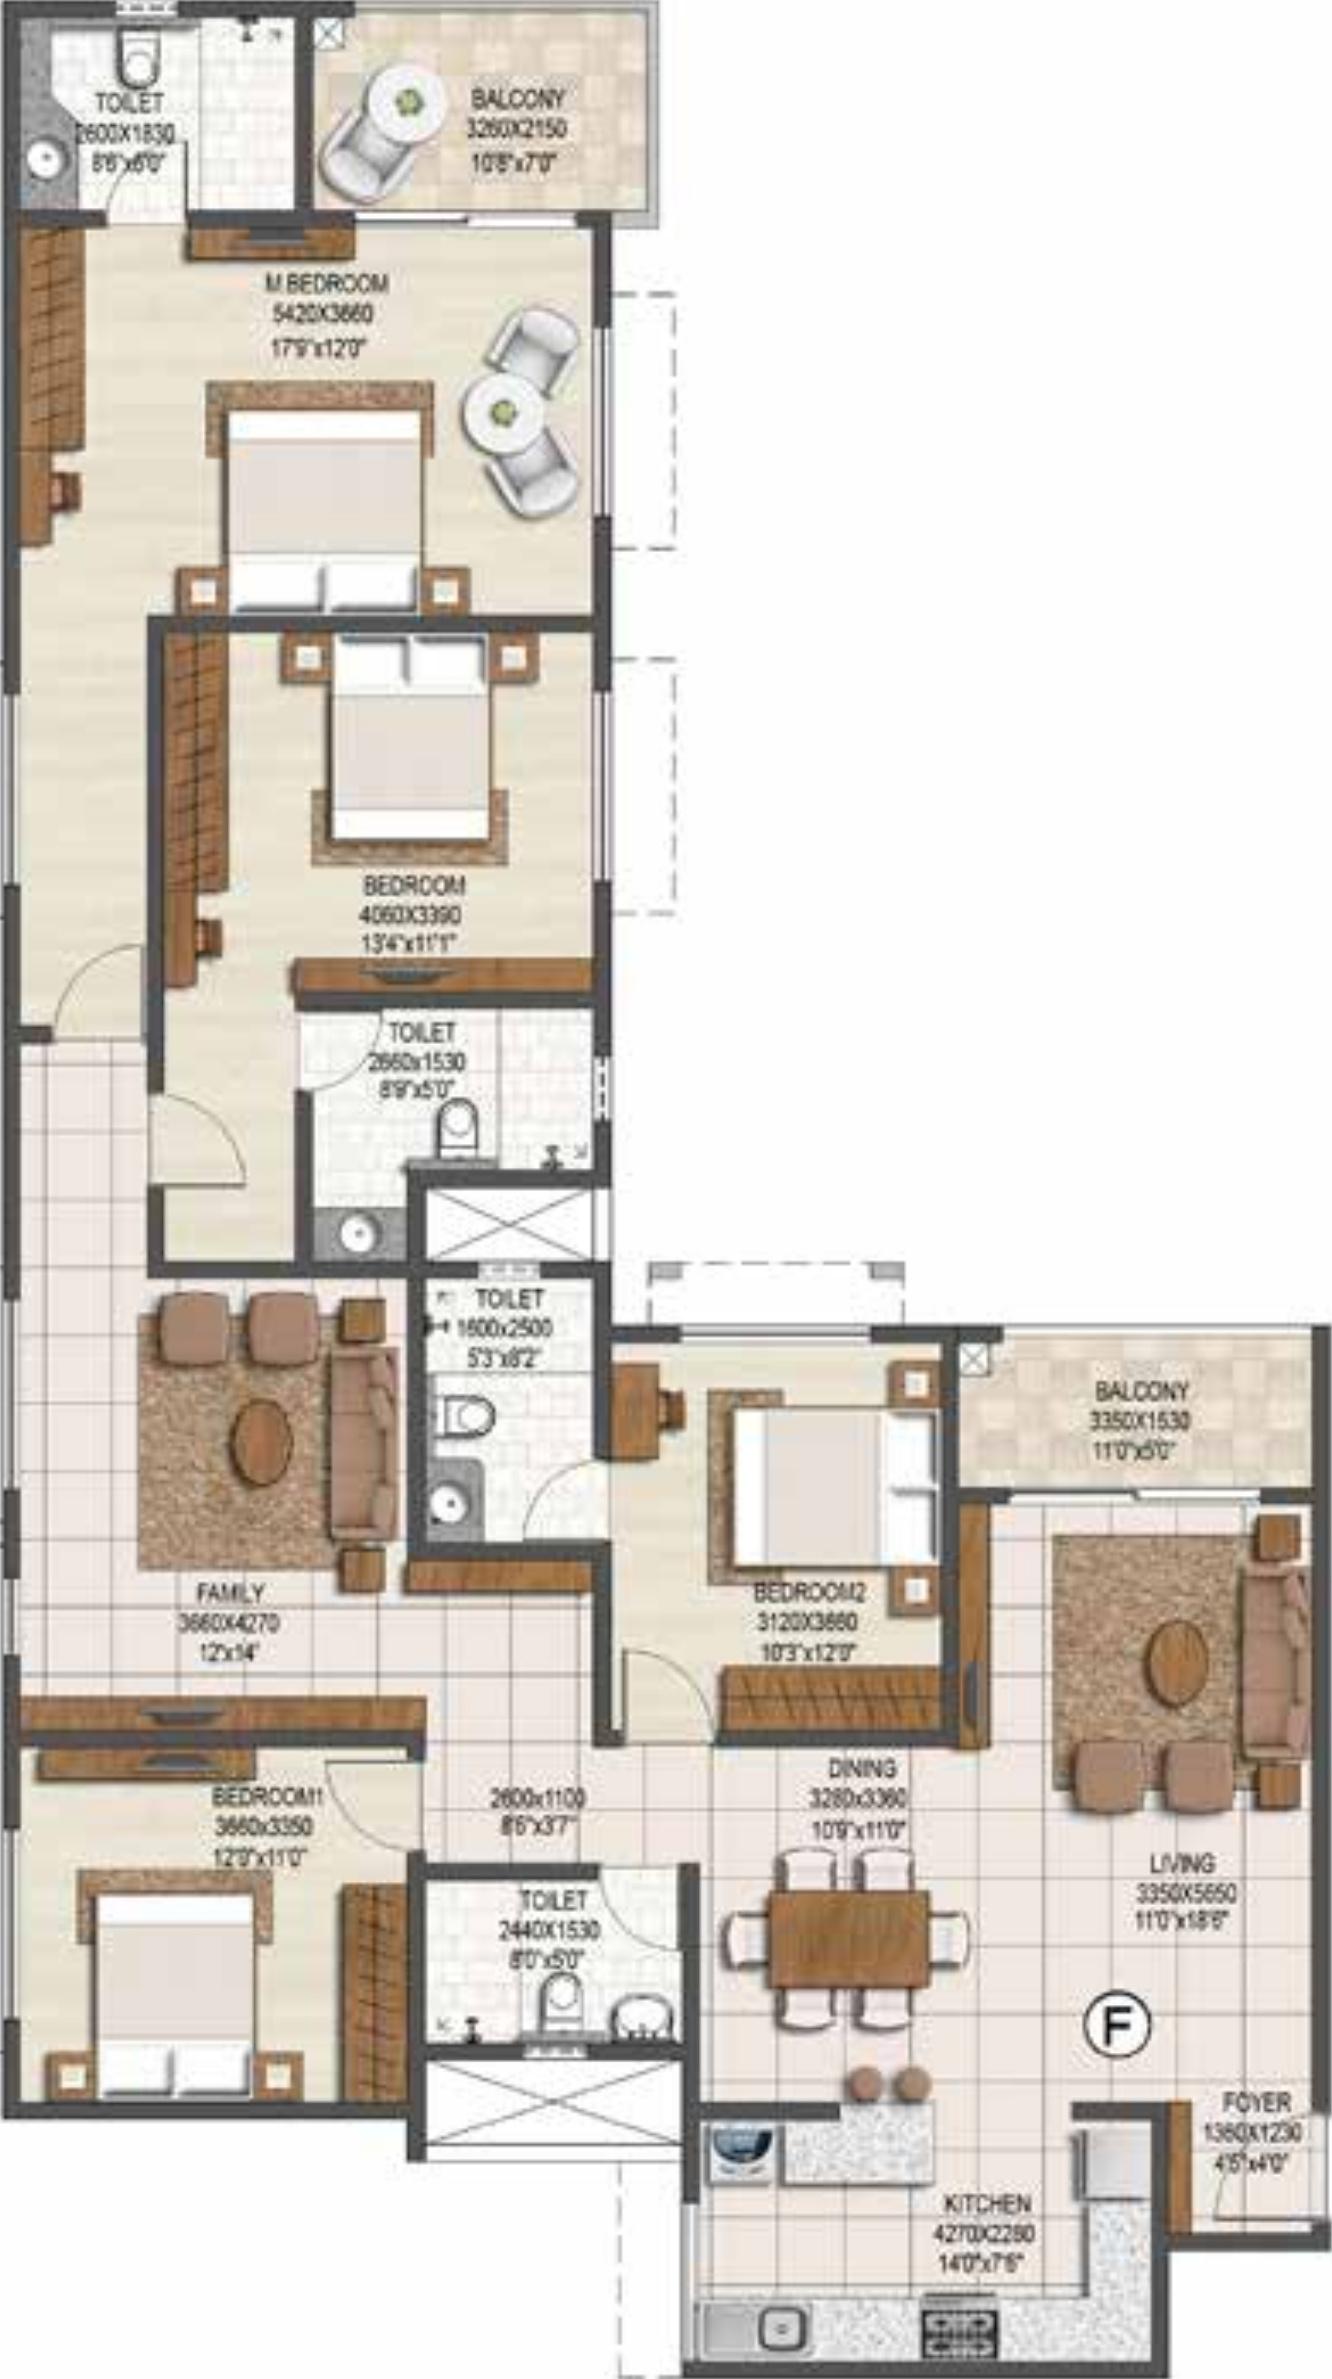 Brigade Buena Vista Phase 2 In Budigere Cross Bangalore Price Location Map Floor Plan Reviews Proptiger Com